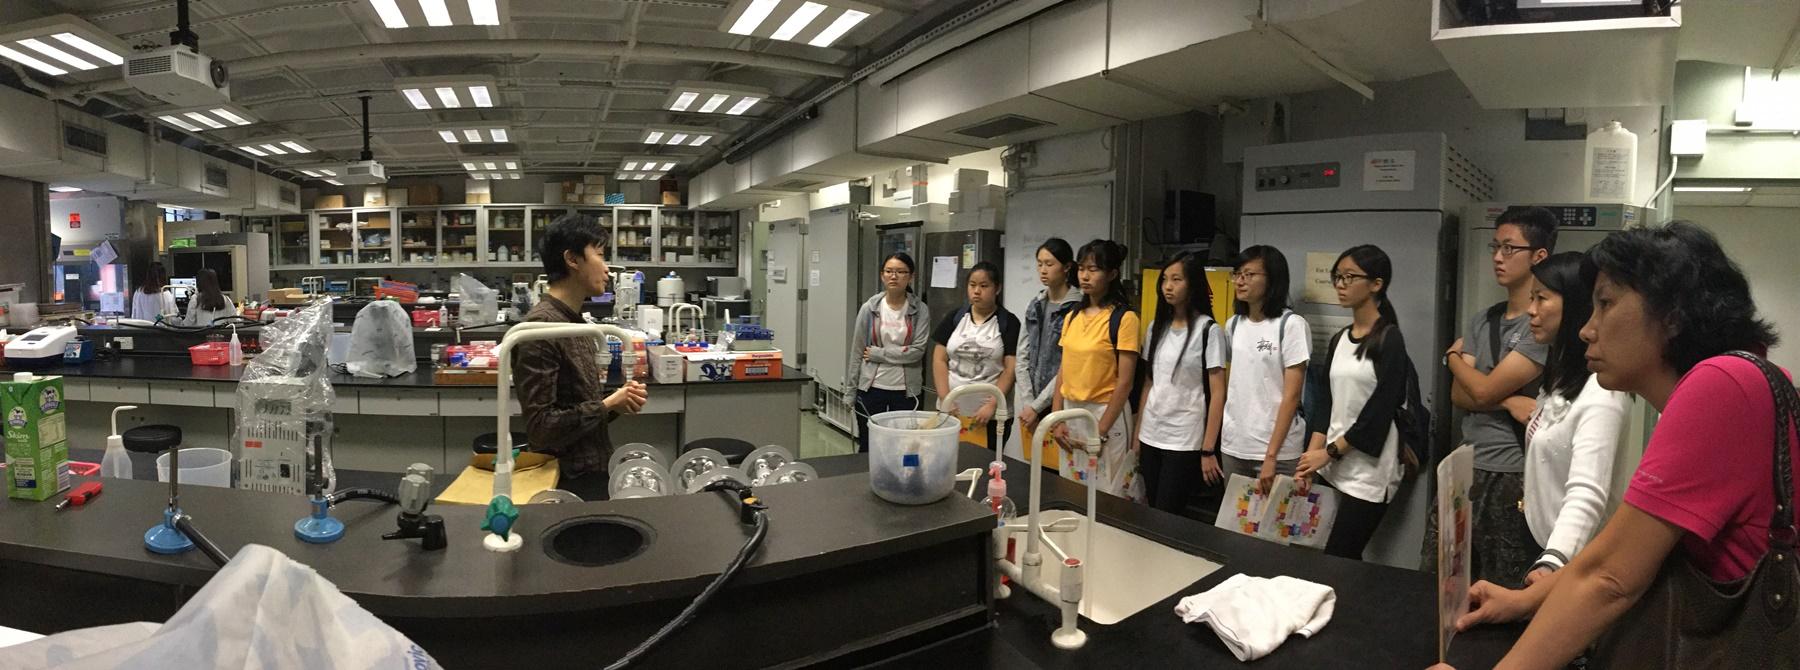 http://www.npc.edu.hk/sites/default/files/img_0409.jpg